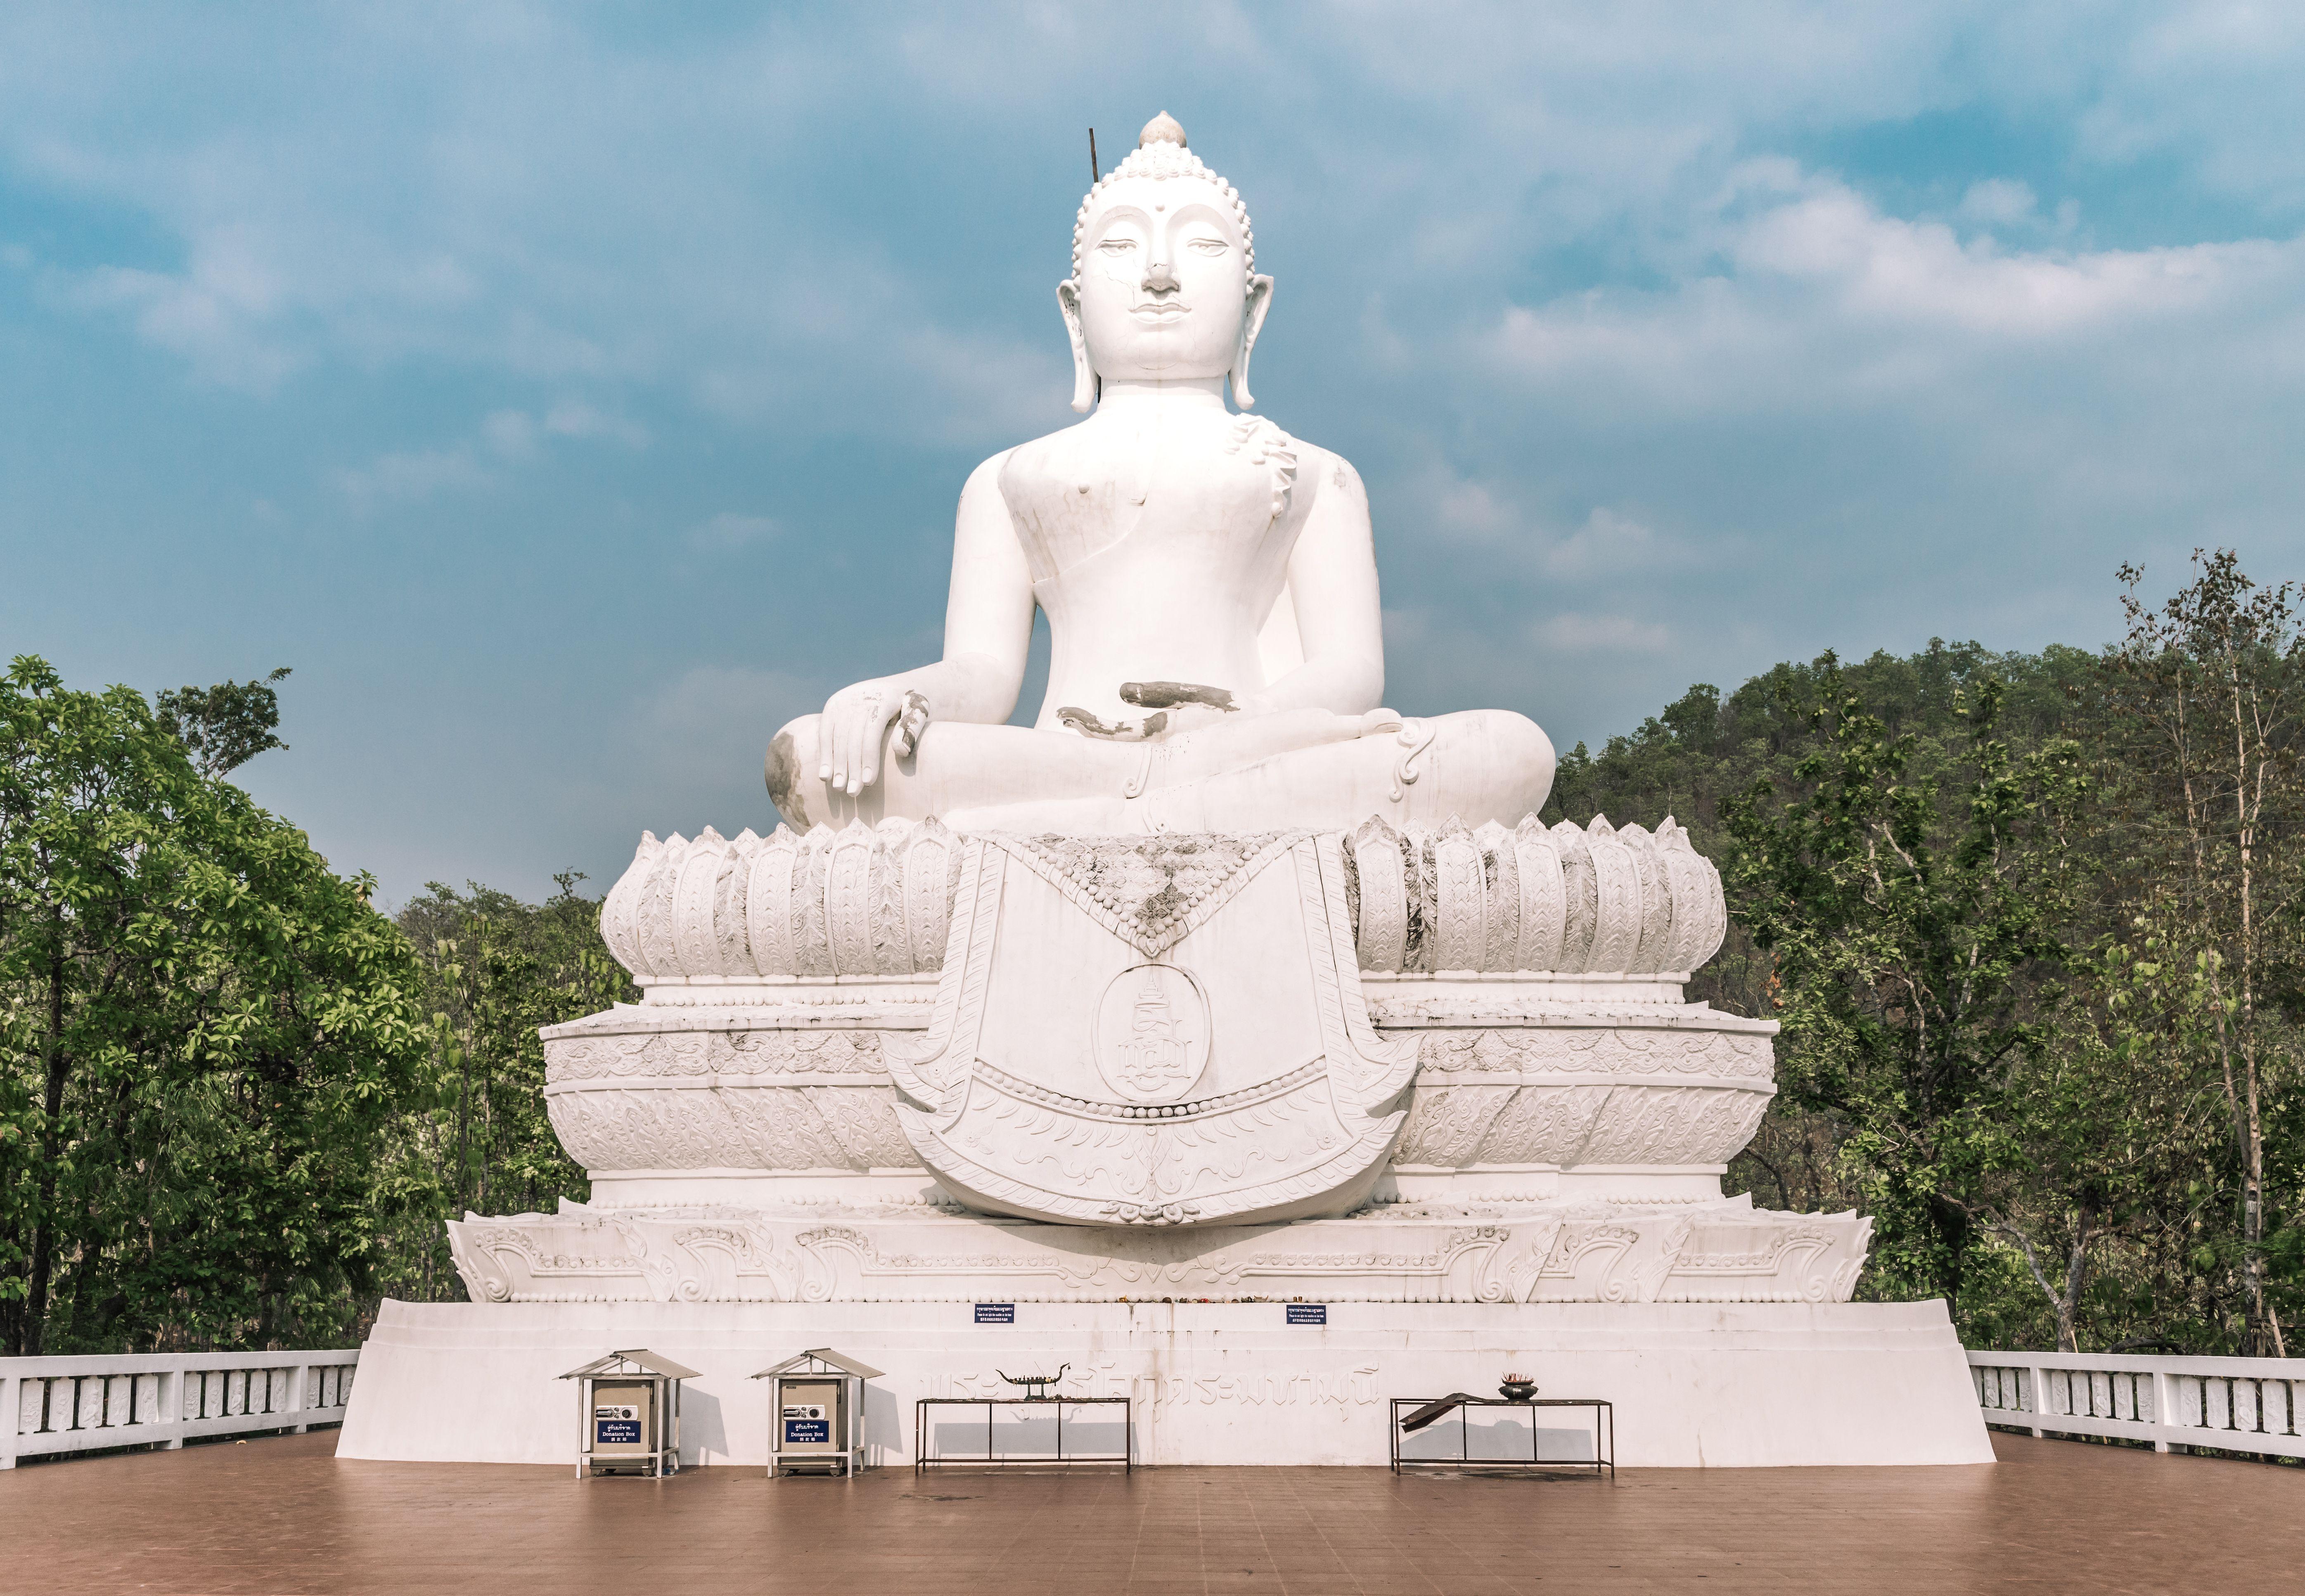 The White Buddha statue in Pai, Thailand